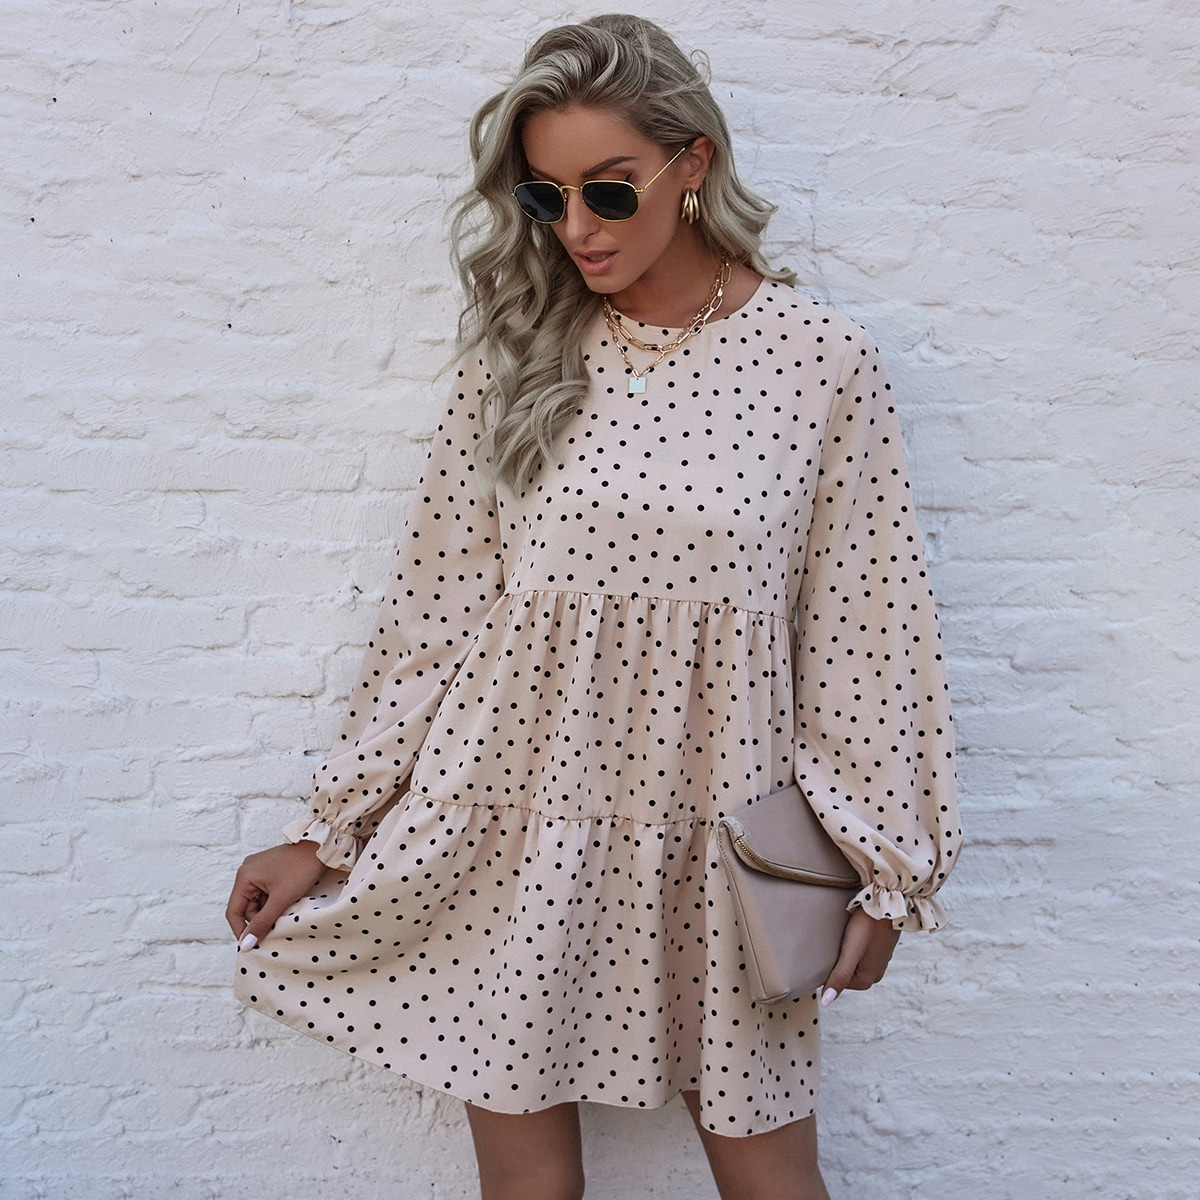 Polka Dot Smock Dress, SHEIN  - buy with discount